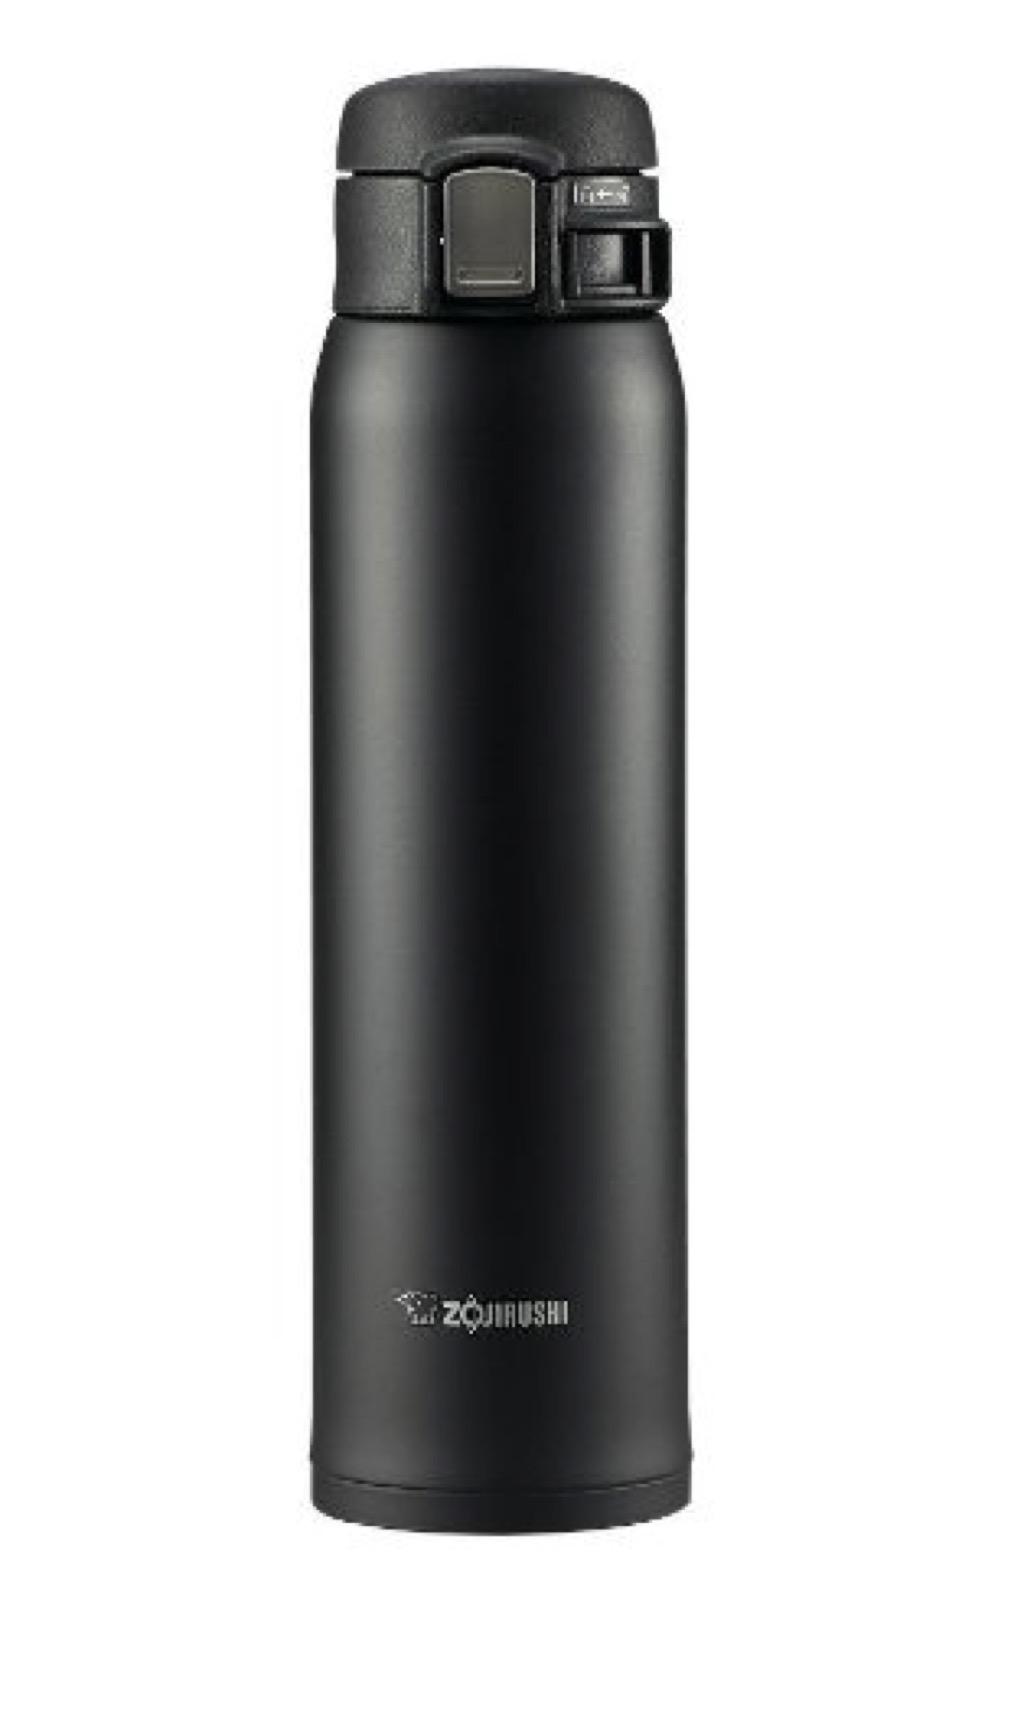 Zojirushi Portable Thermos